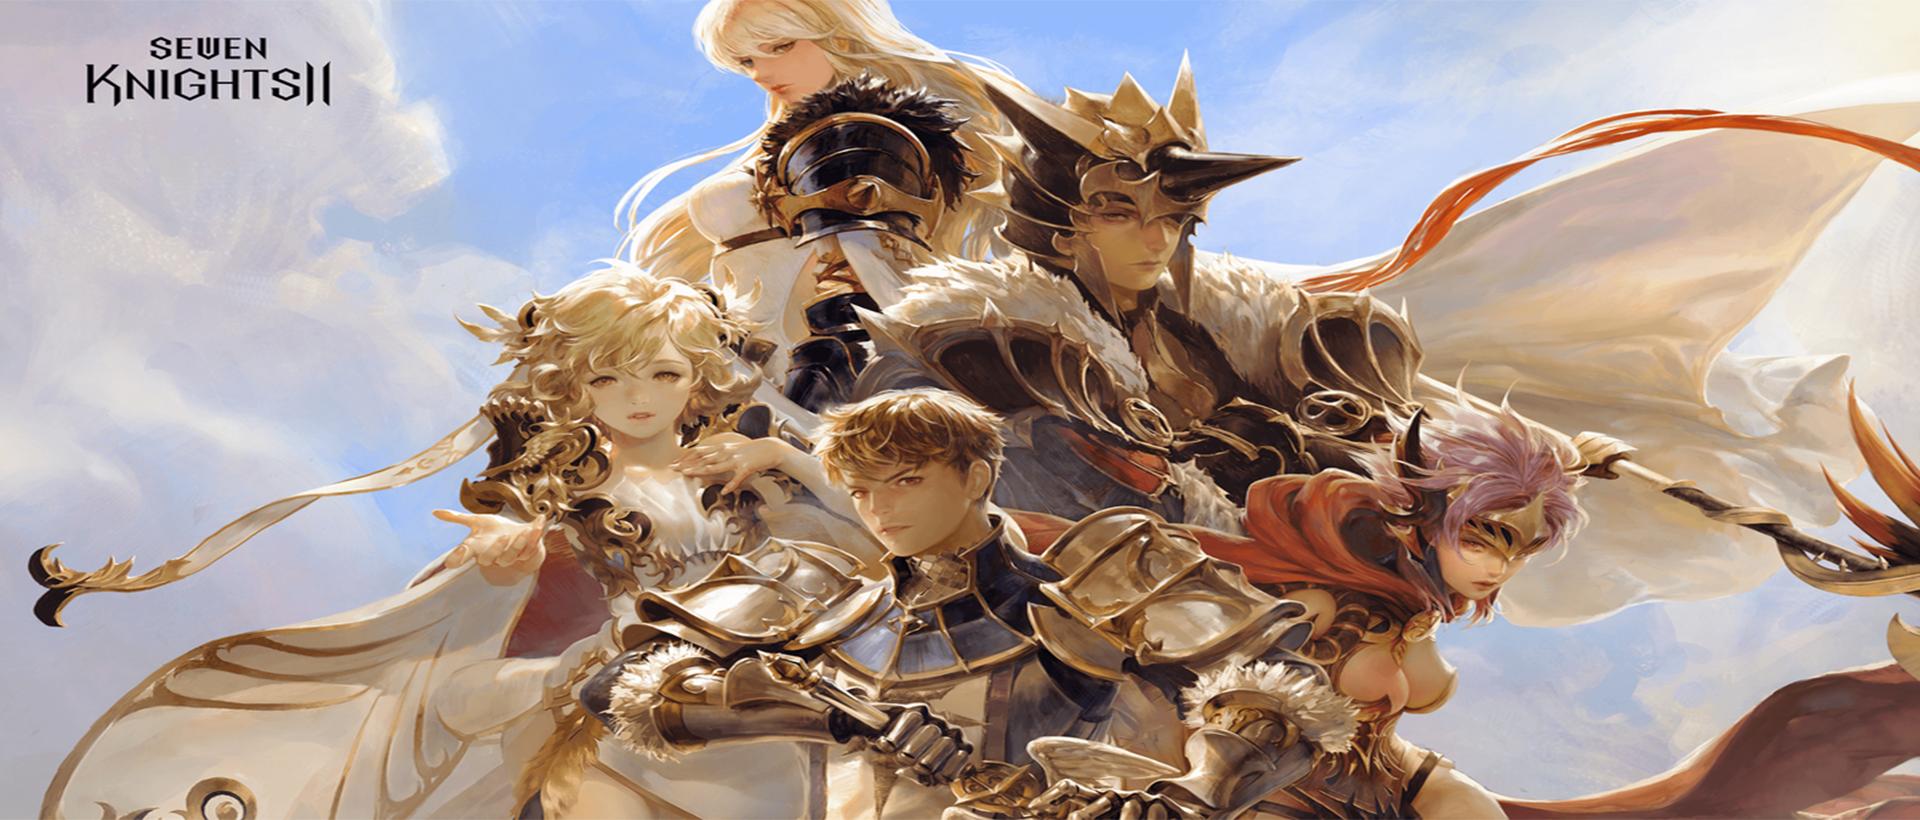 Seven Knights 2